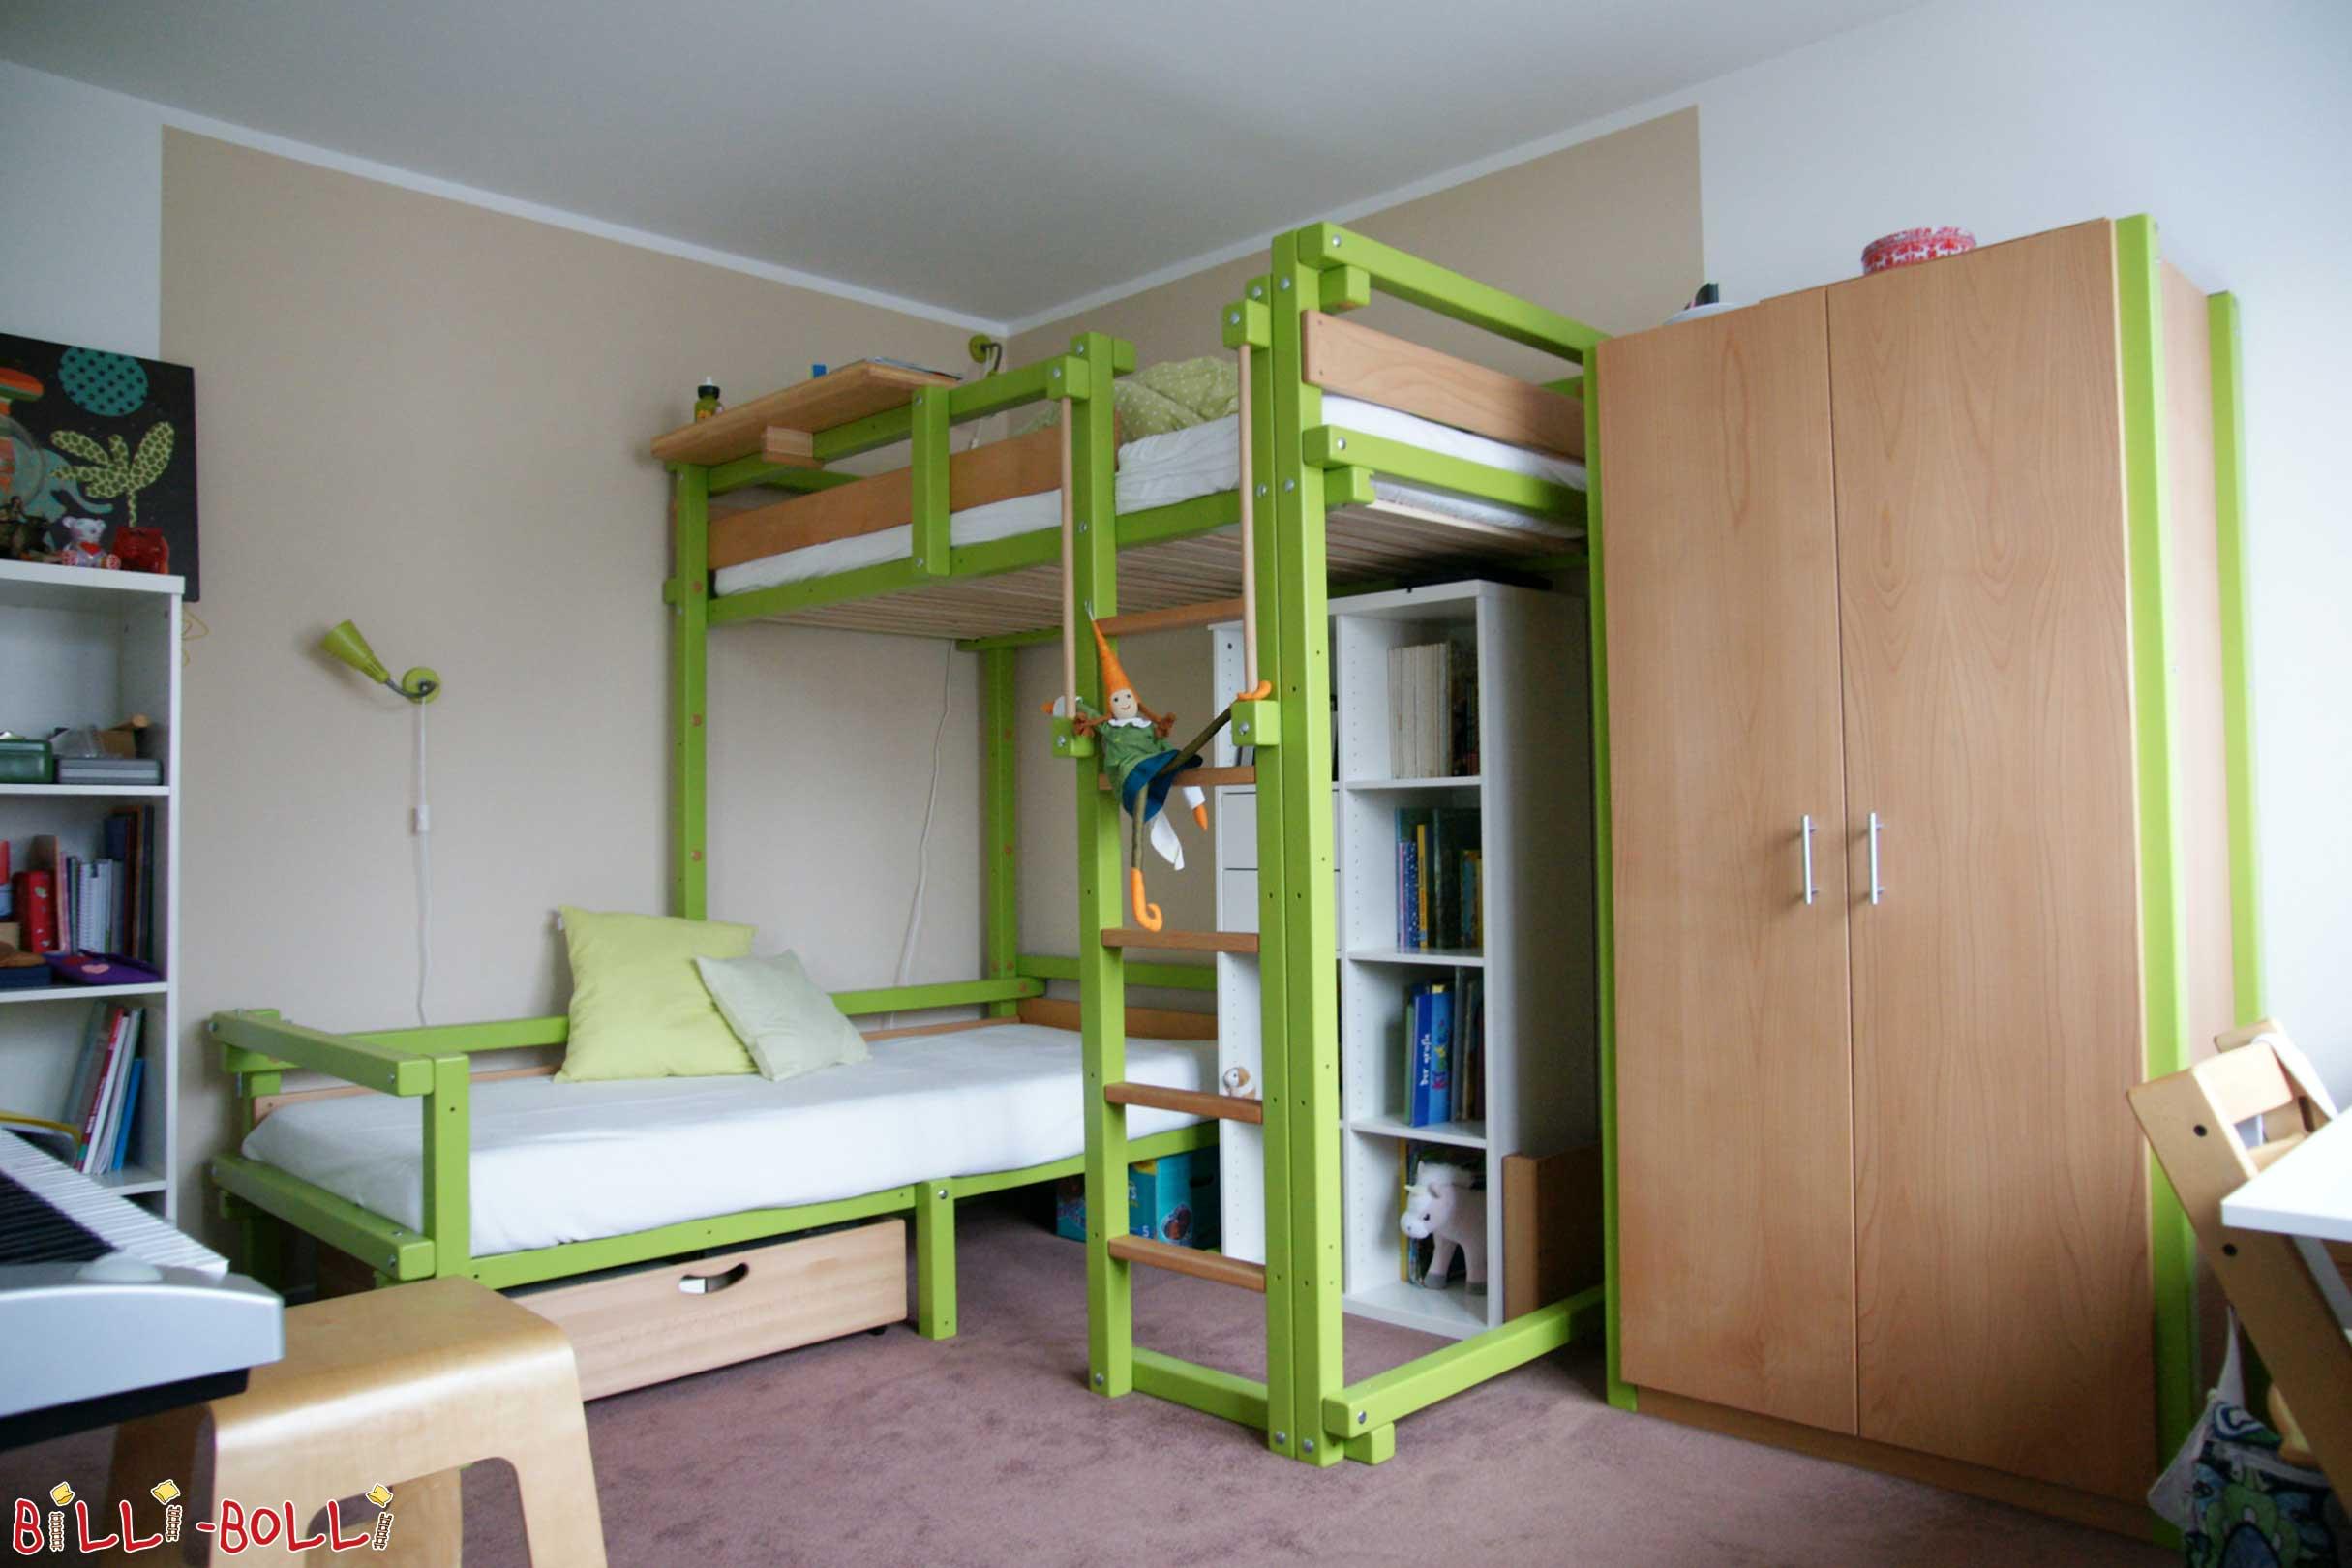 etagenbett ber eck billi bolli kinderm bel. Black Bedroom Furniture Sets. Home Design Ideas